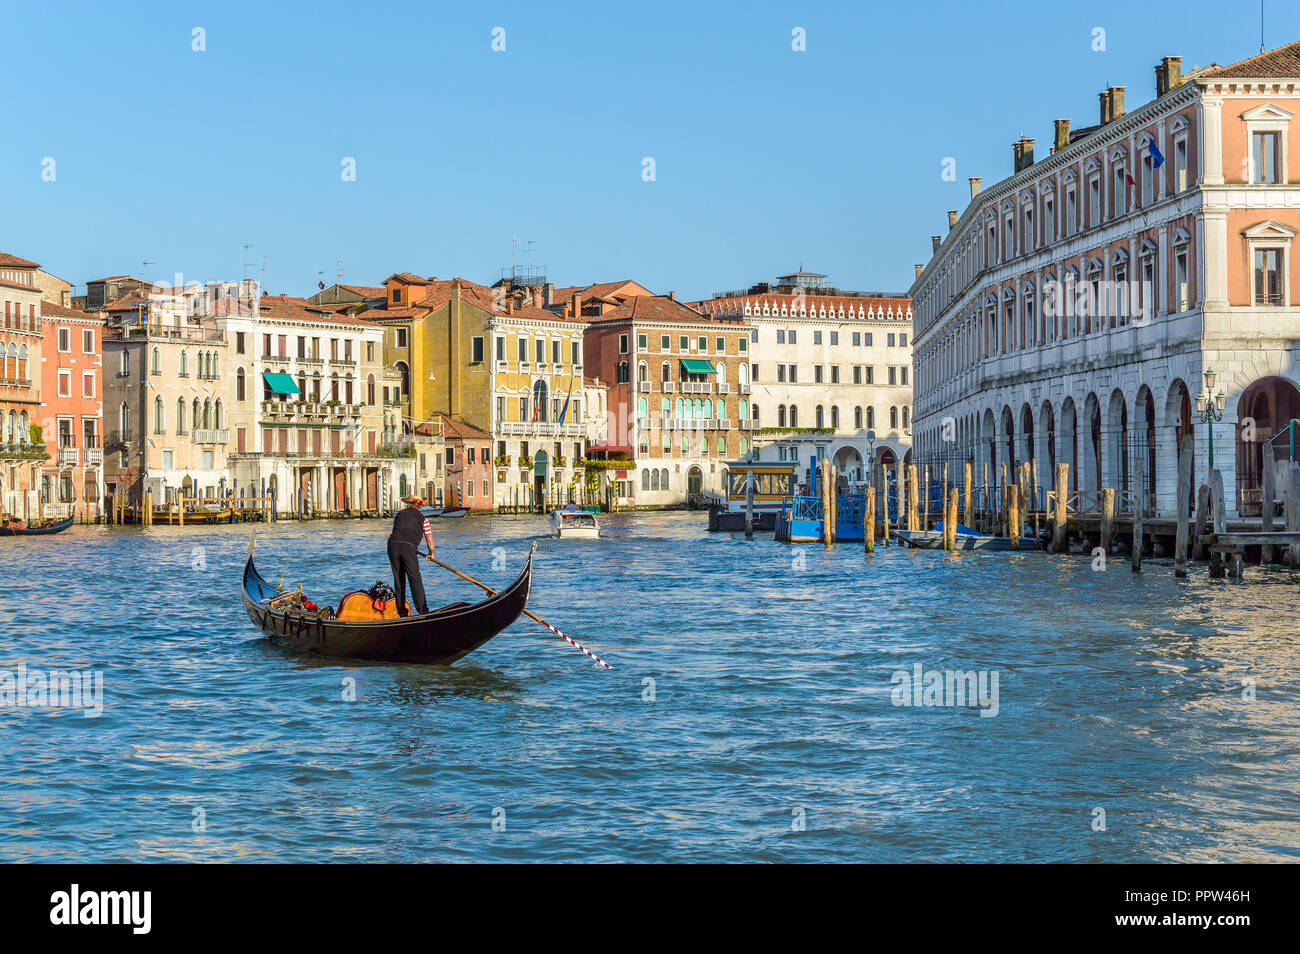 Venice, Italy: Beautiful view with a gondolier on Grand Canal near Rialto Fish Market Stock Photo